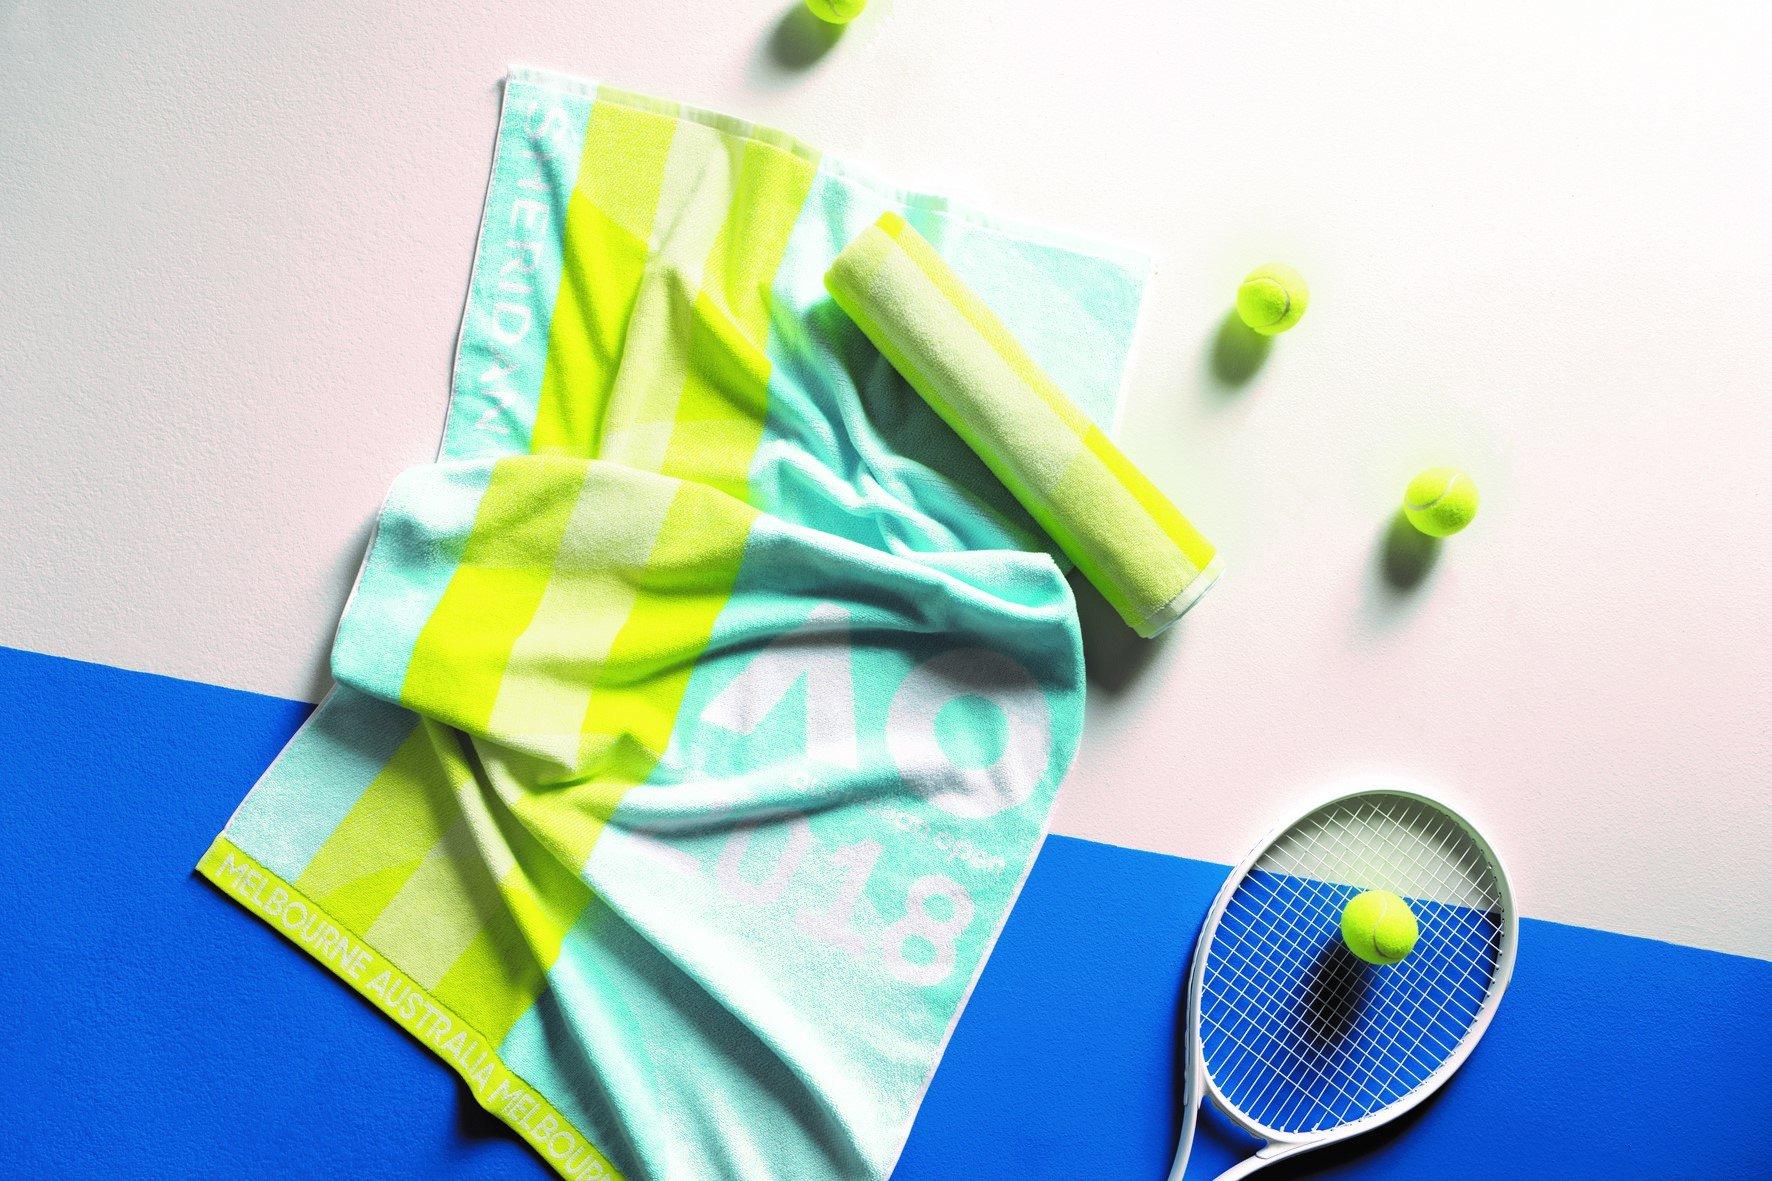 Australian Open 2018 Ladies on Court Player Towel New!! 2018